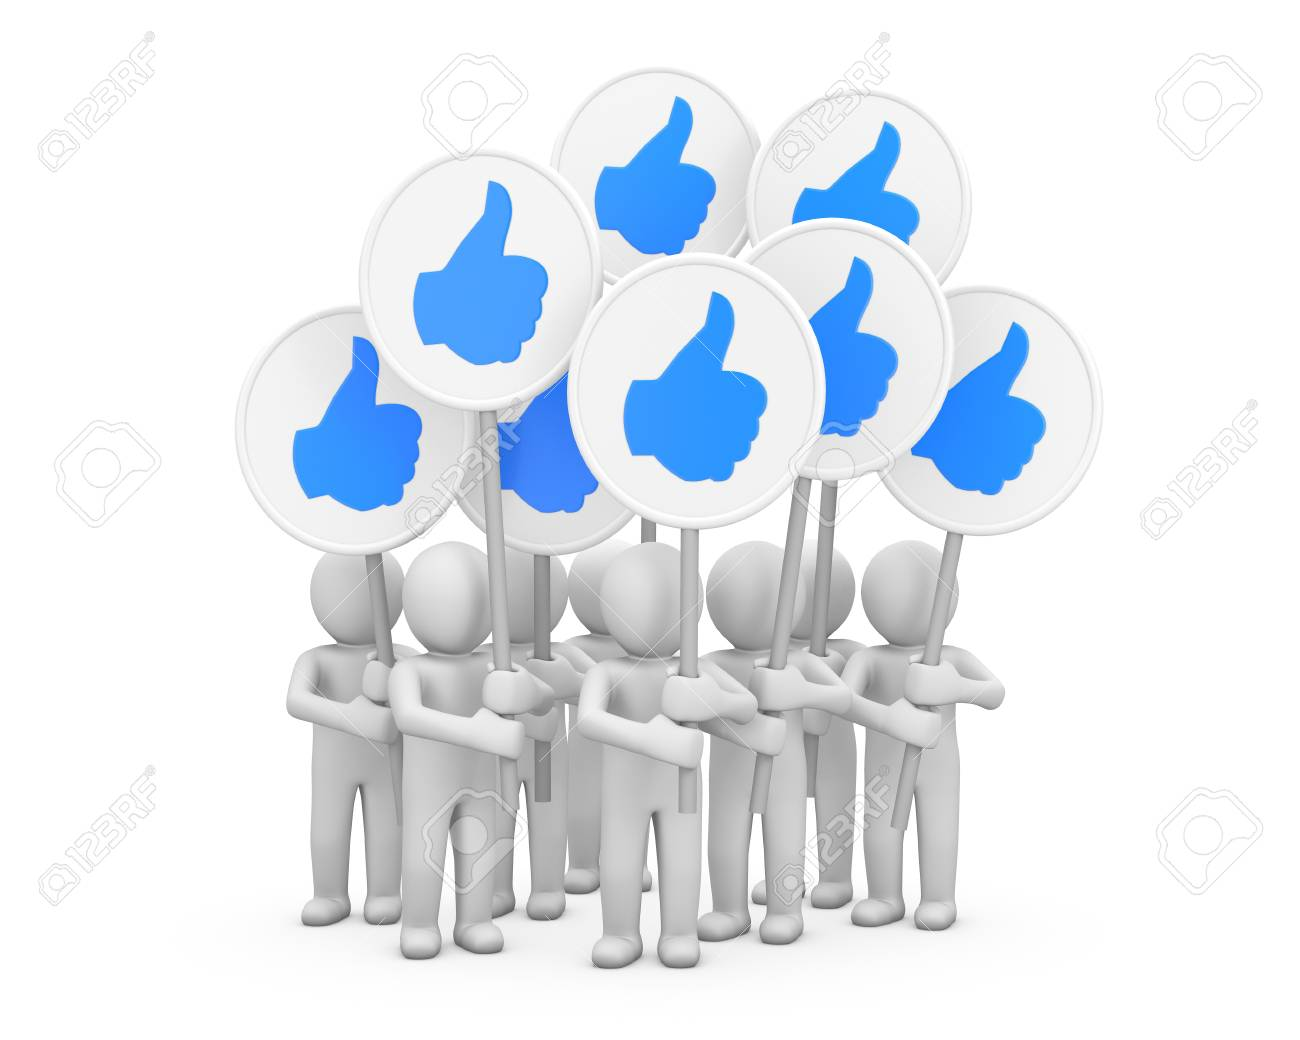 social media symbol Stock Photo - 26100624